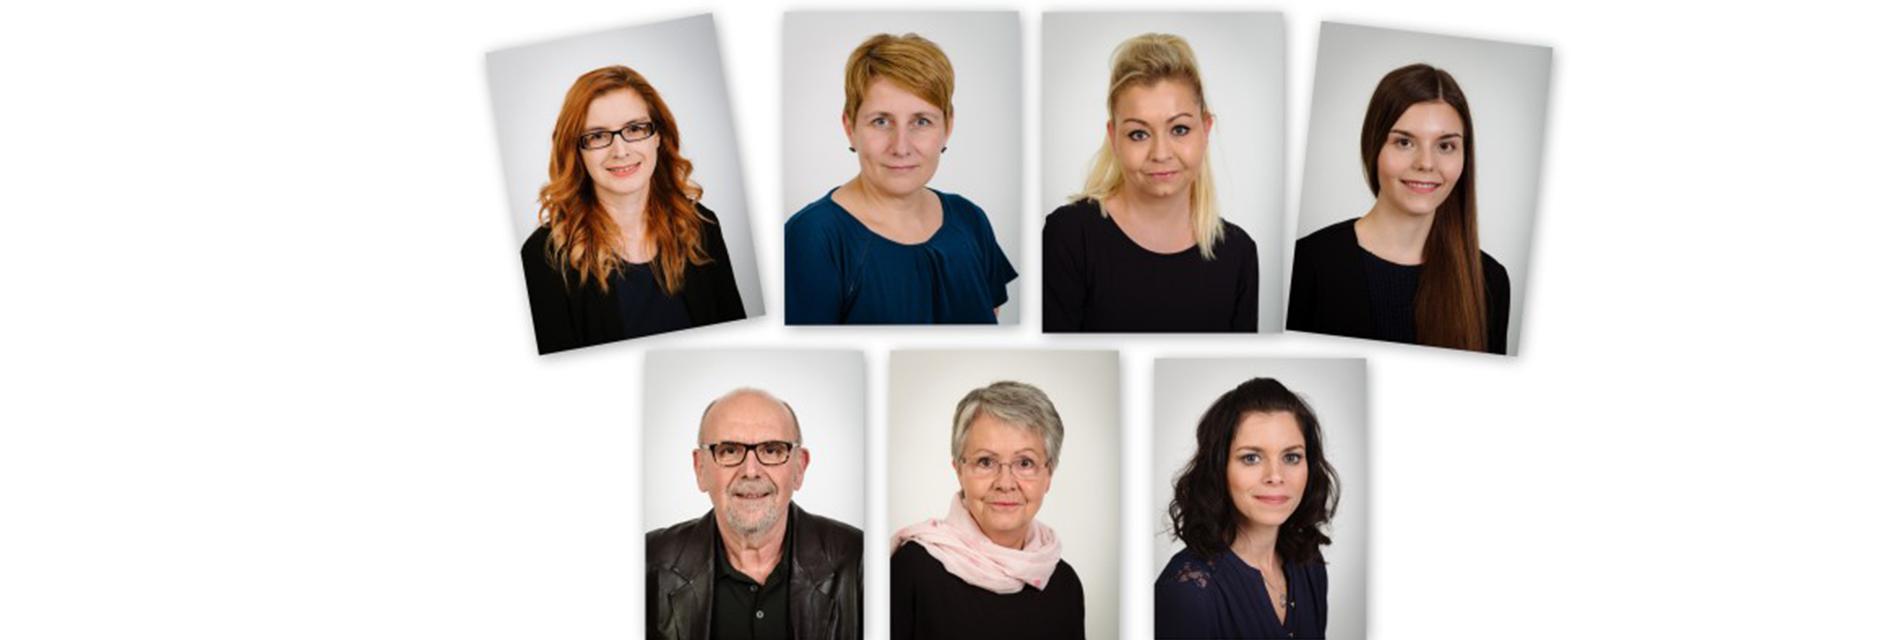 Reisebüro Conrad Weimar Teamfoto